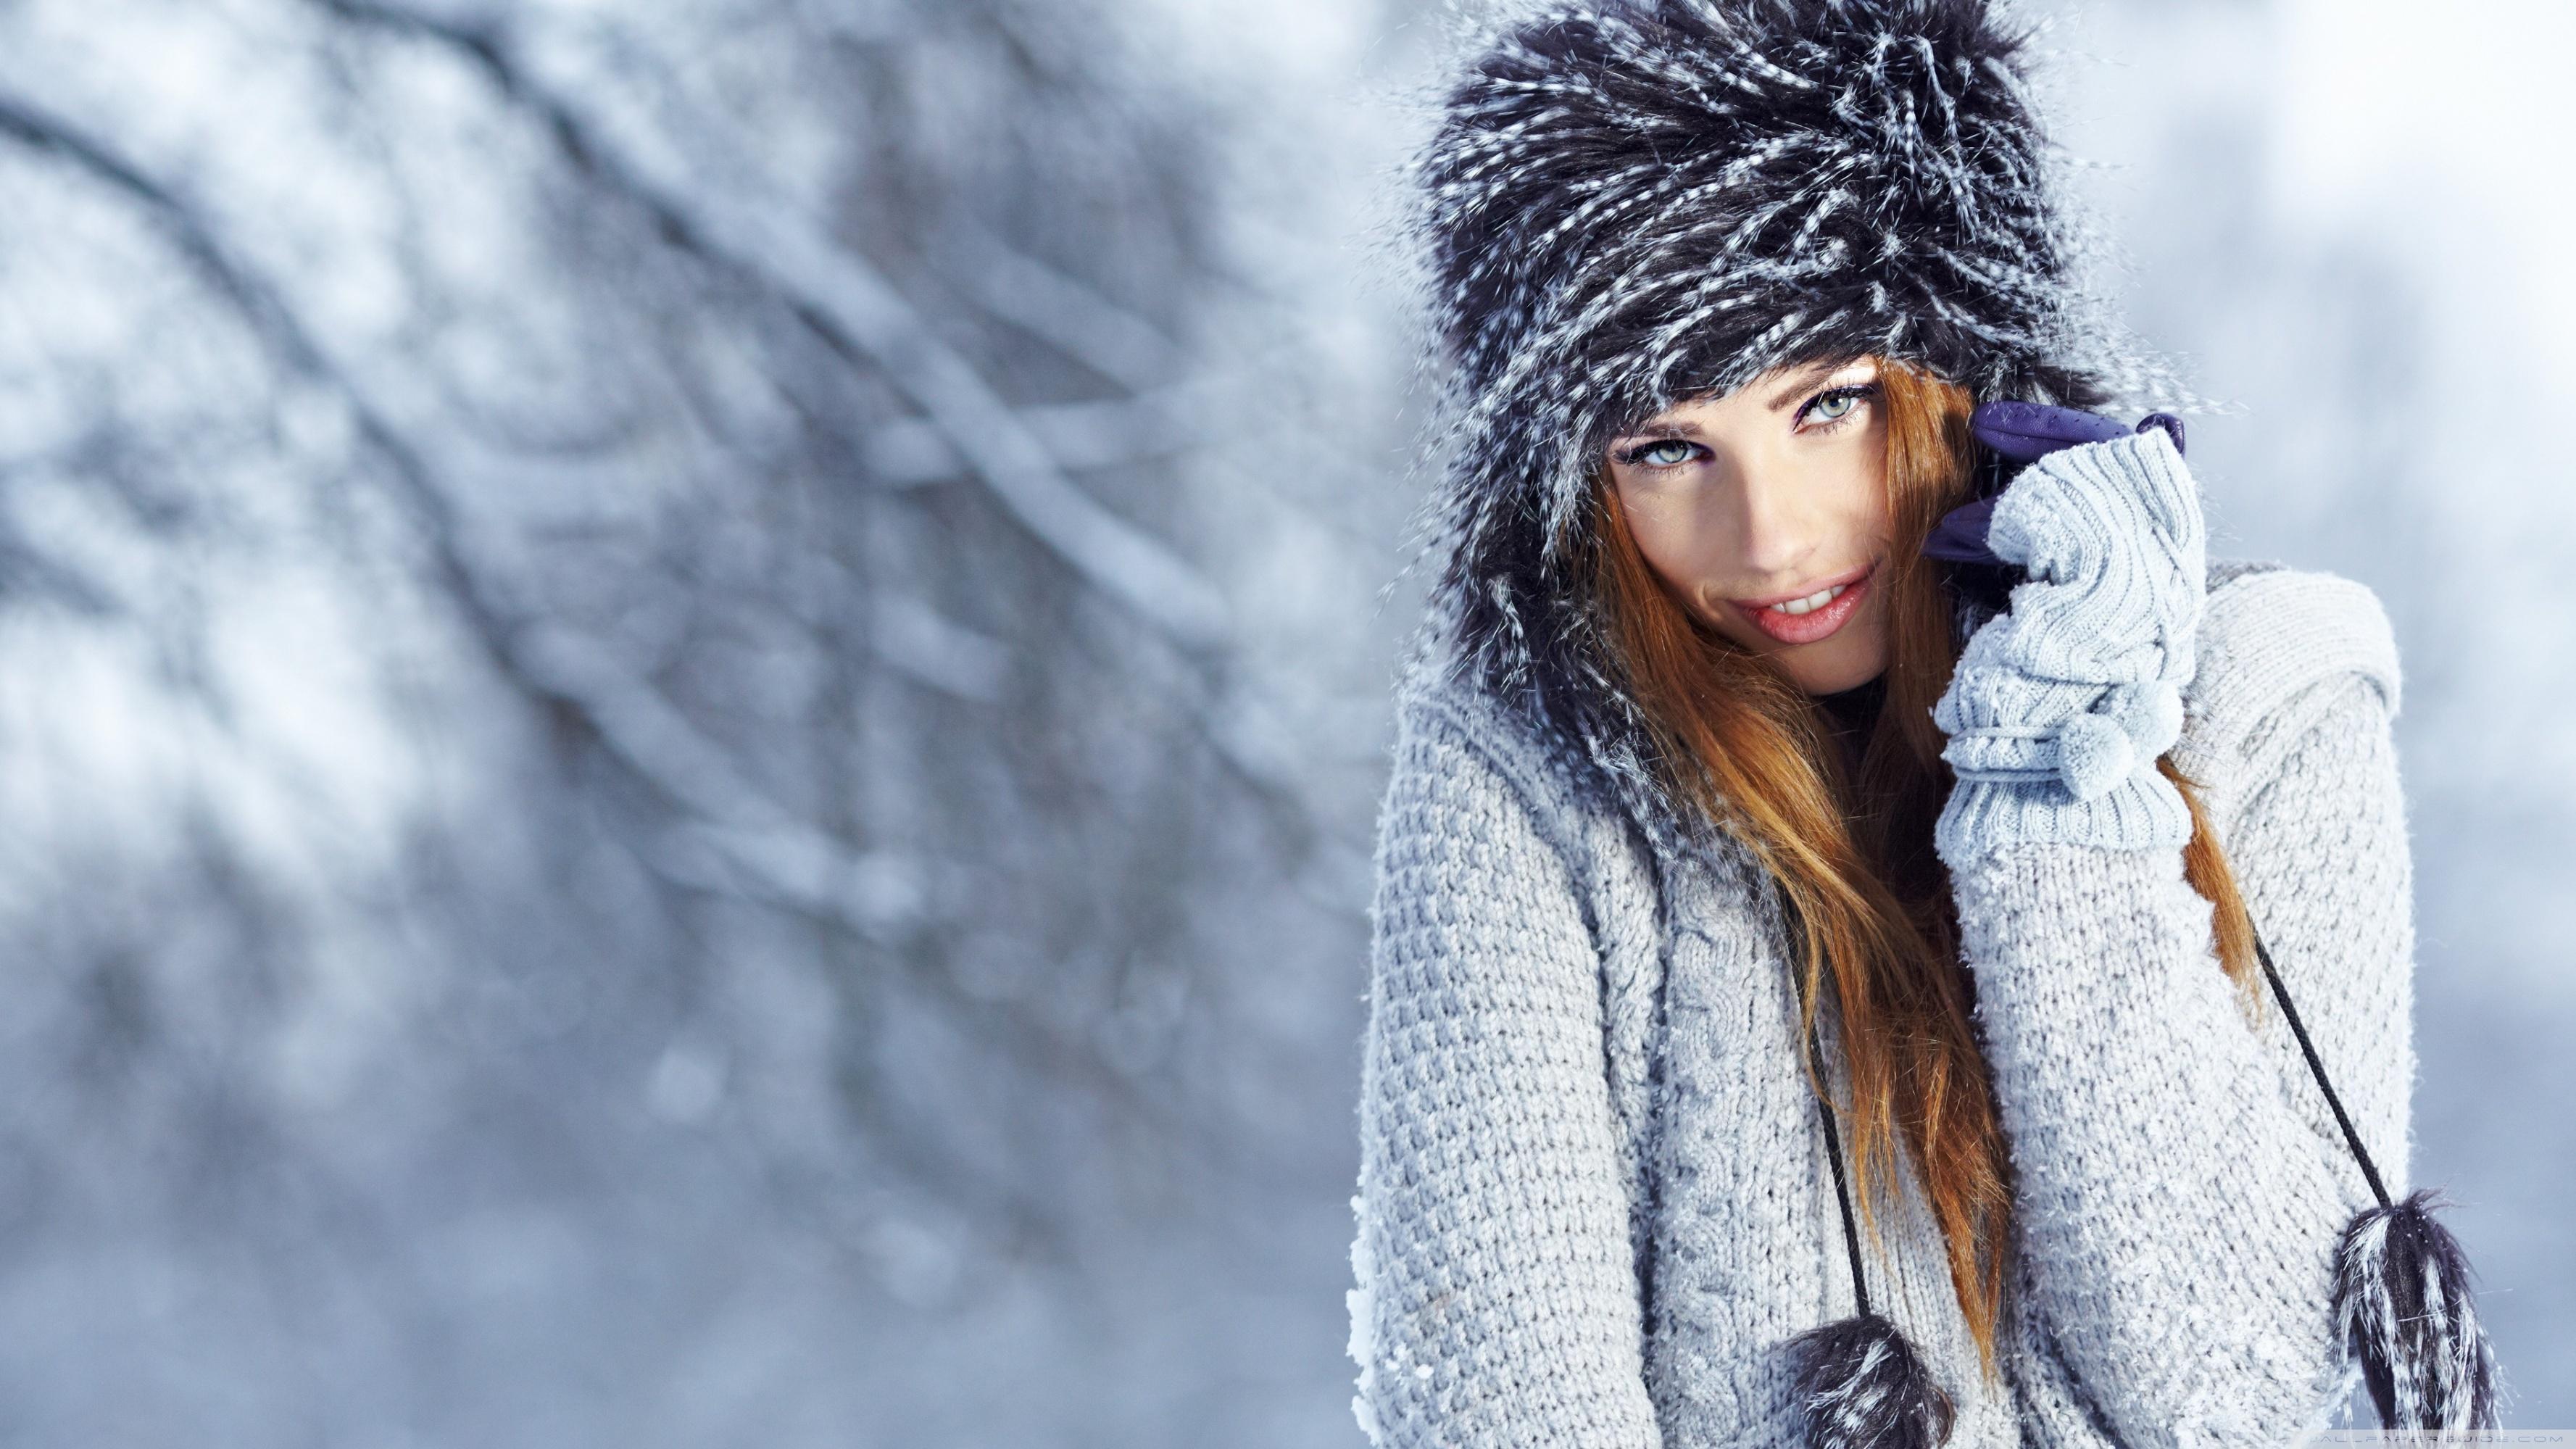 Download Free WallpaperWinter Girl Portrait